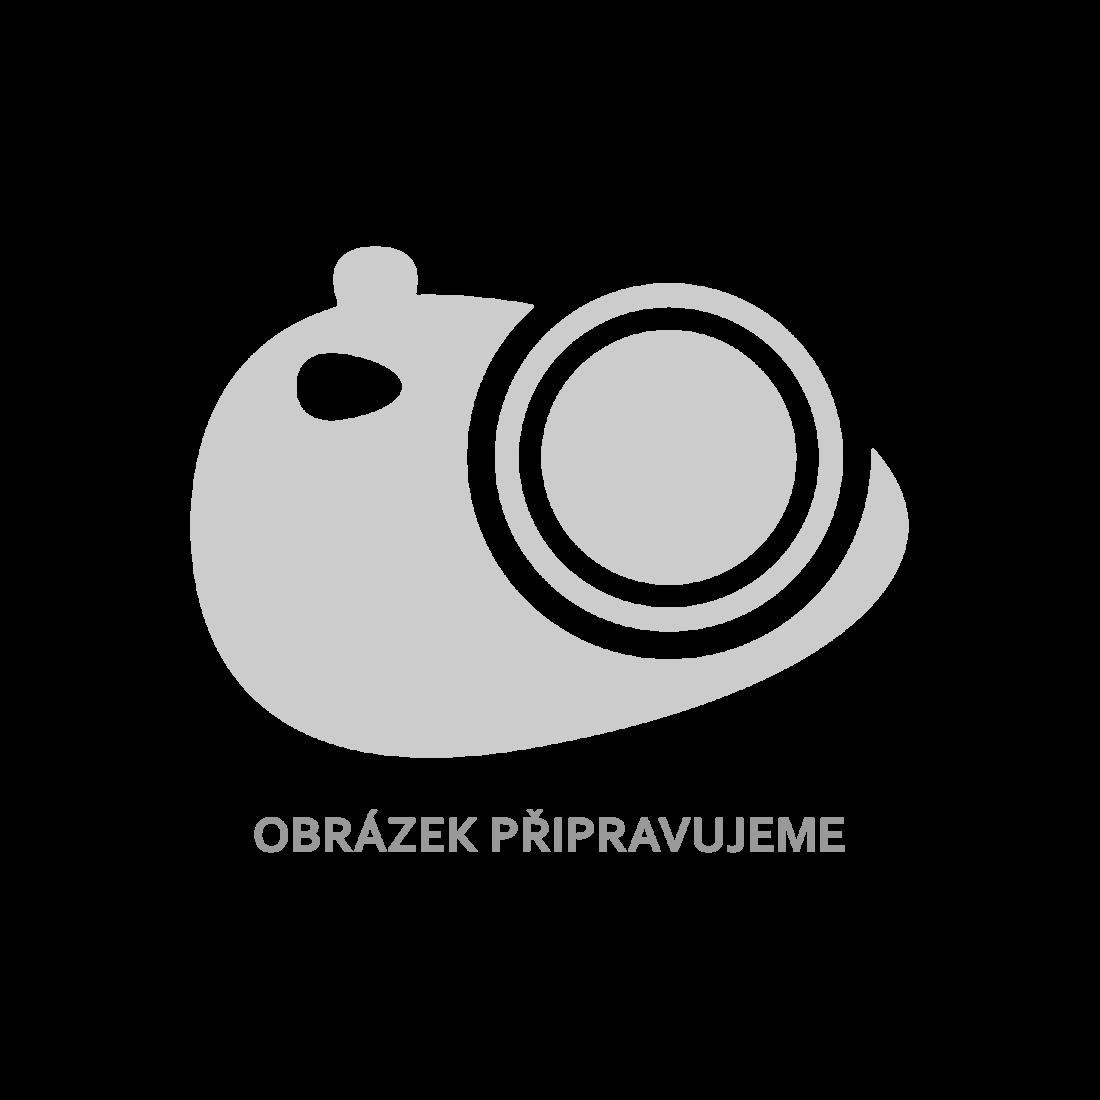 vidaXL Knihovna šedá 60 x 24 x 74,5 cm dřevotříska [800857]